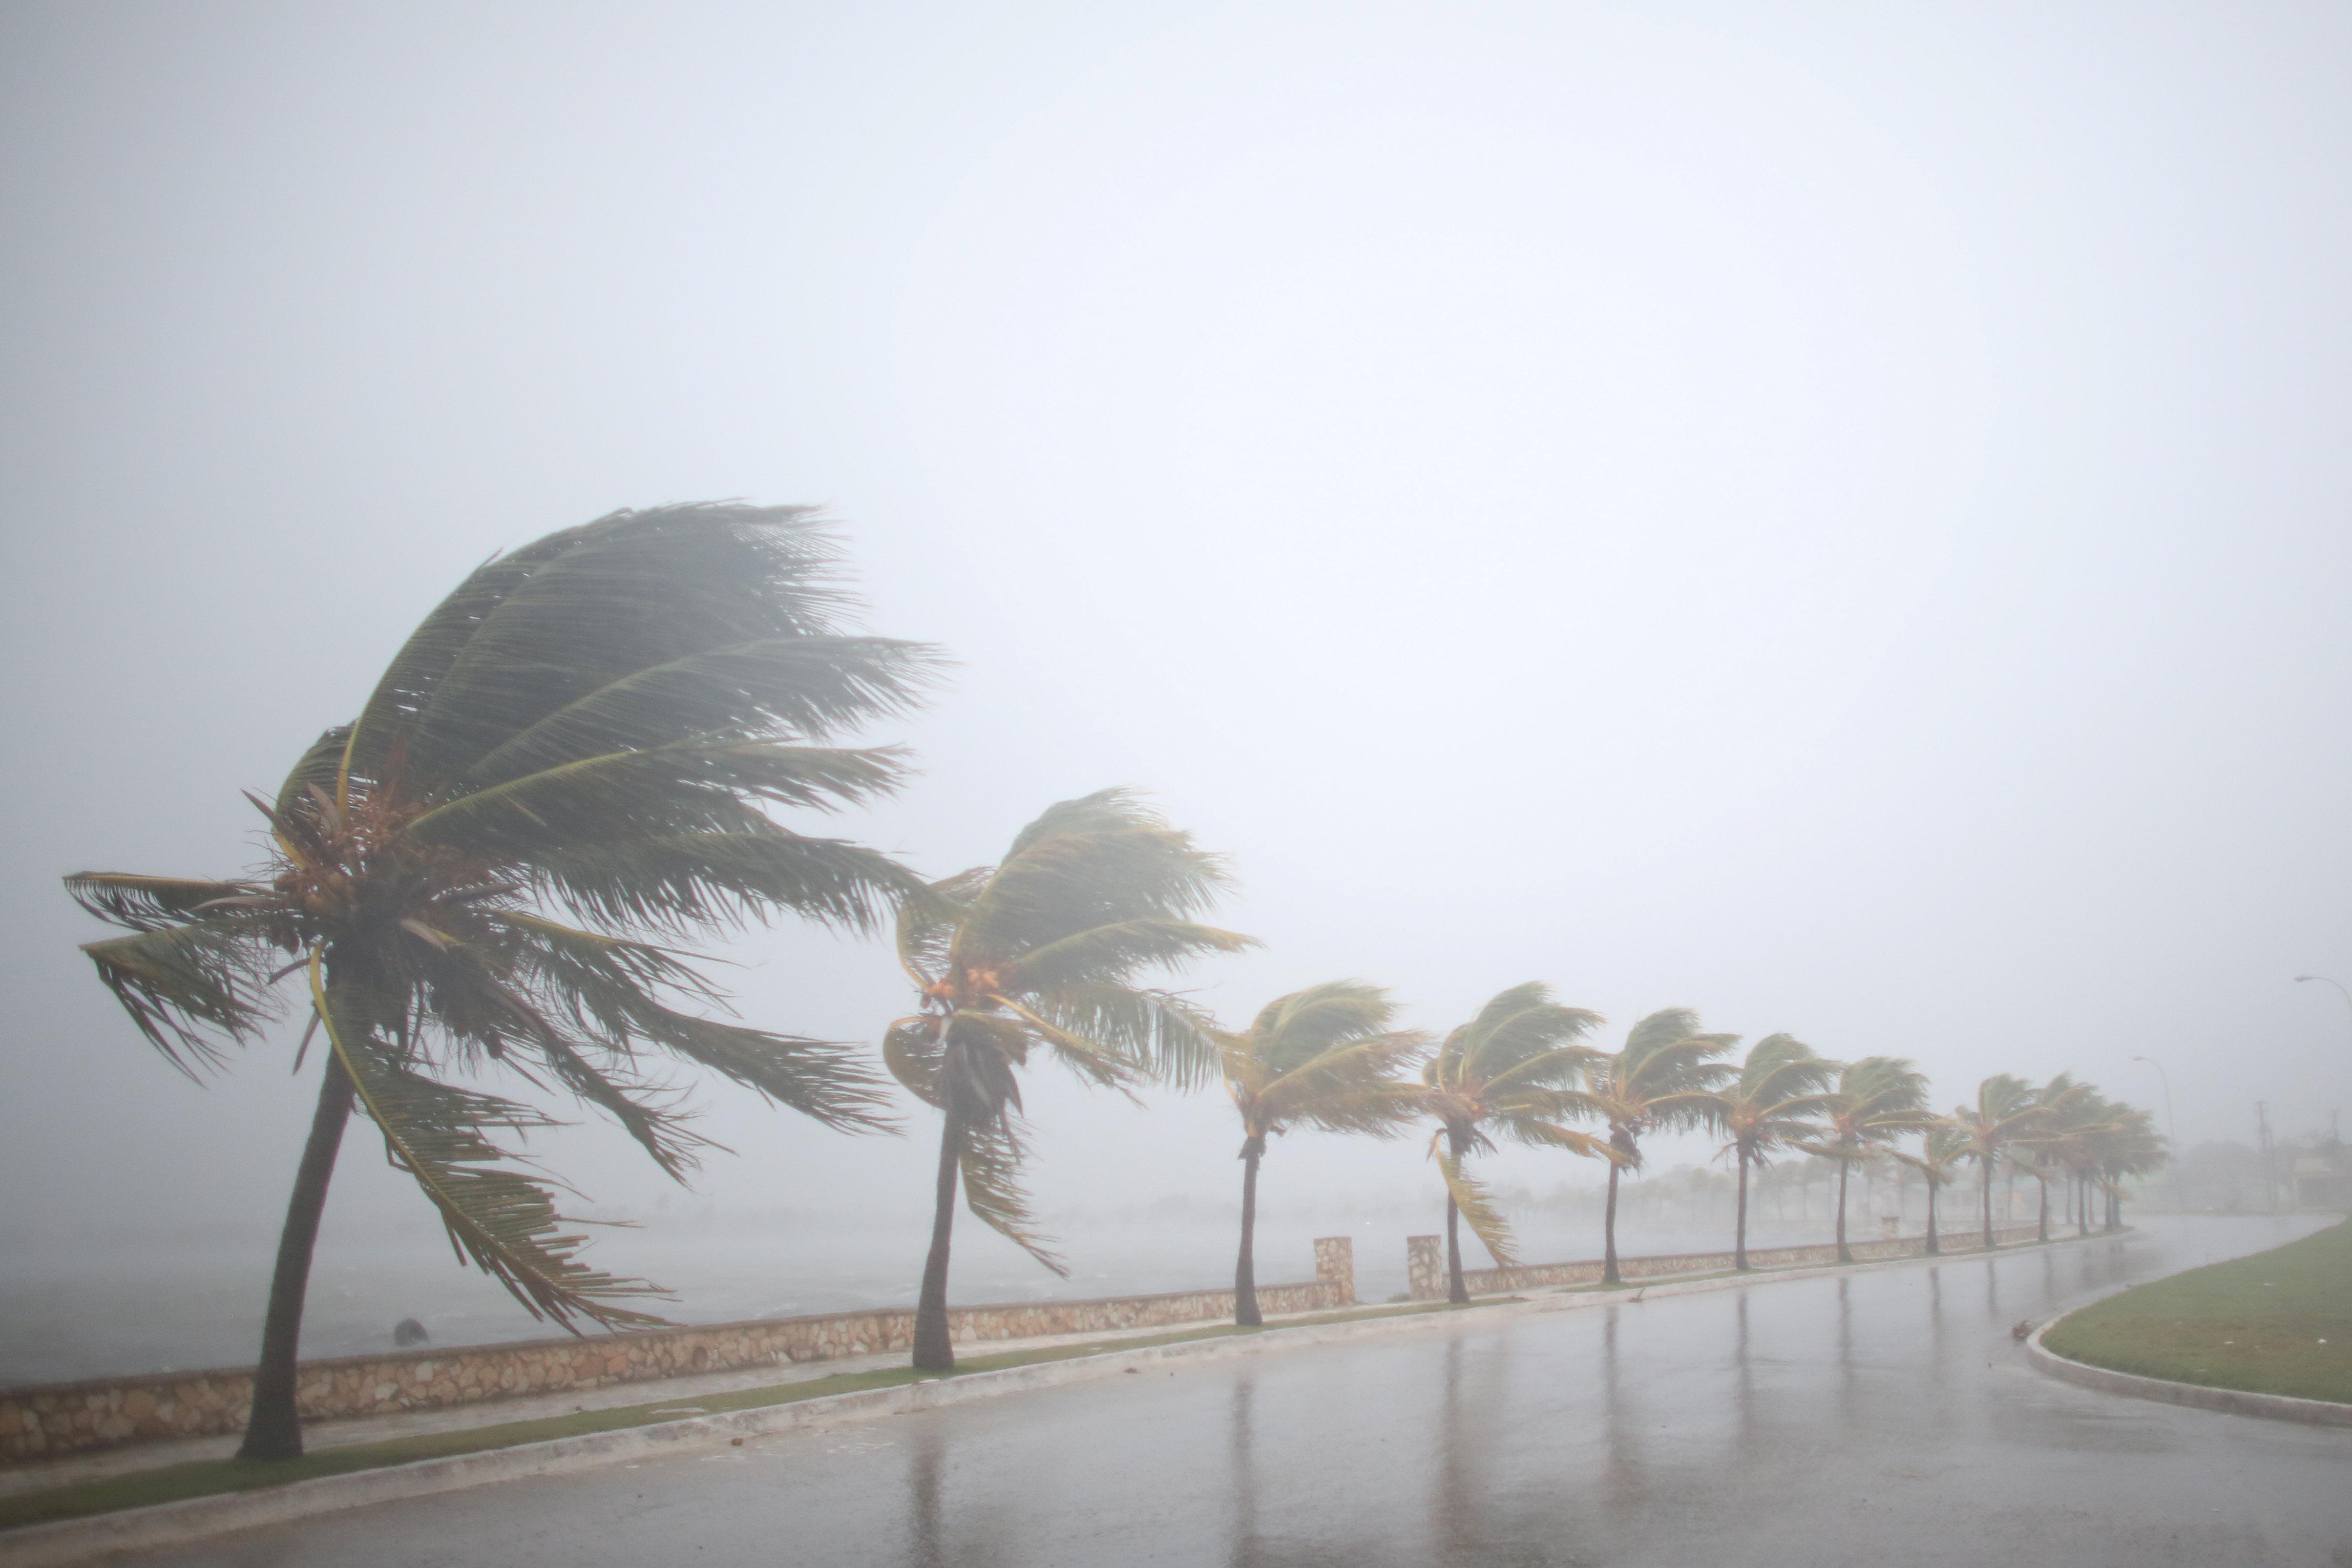 Heres How to Help Hurricane Irma Victims